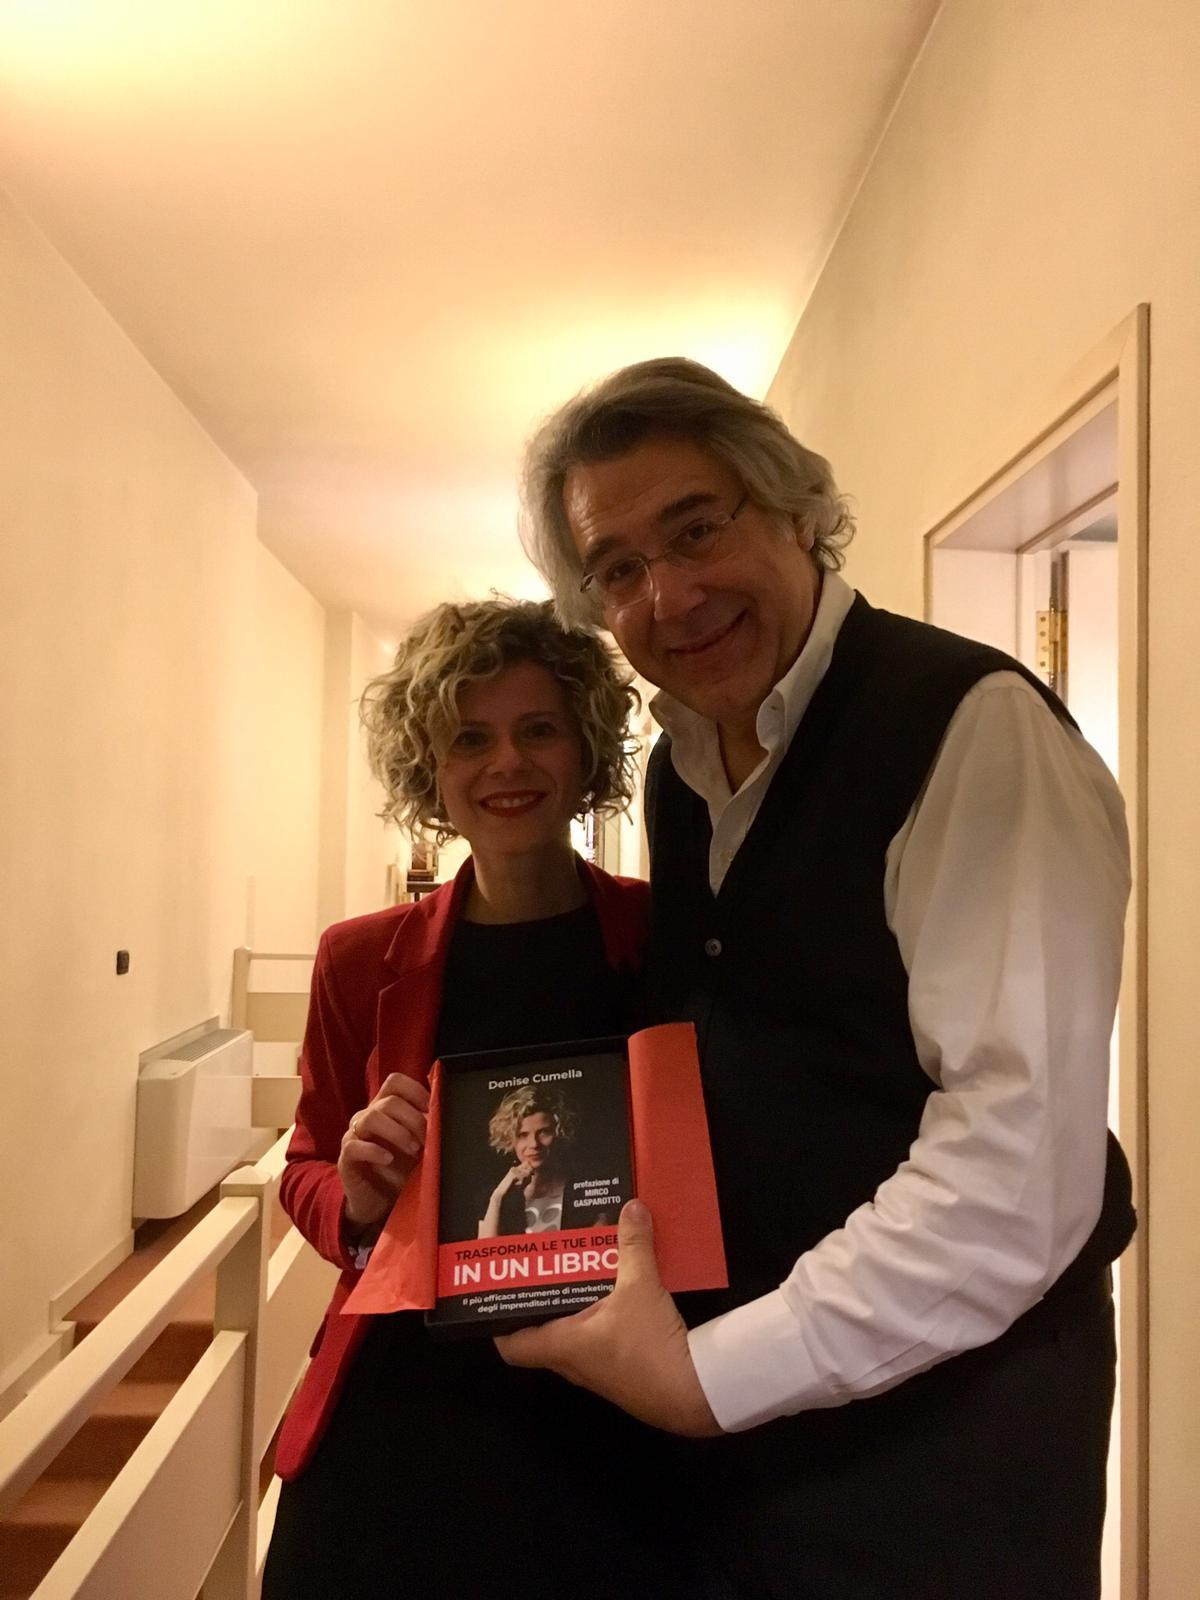 Evento lancio libro Denise Cumella